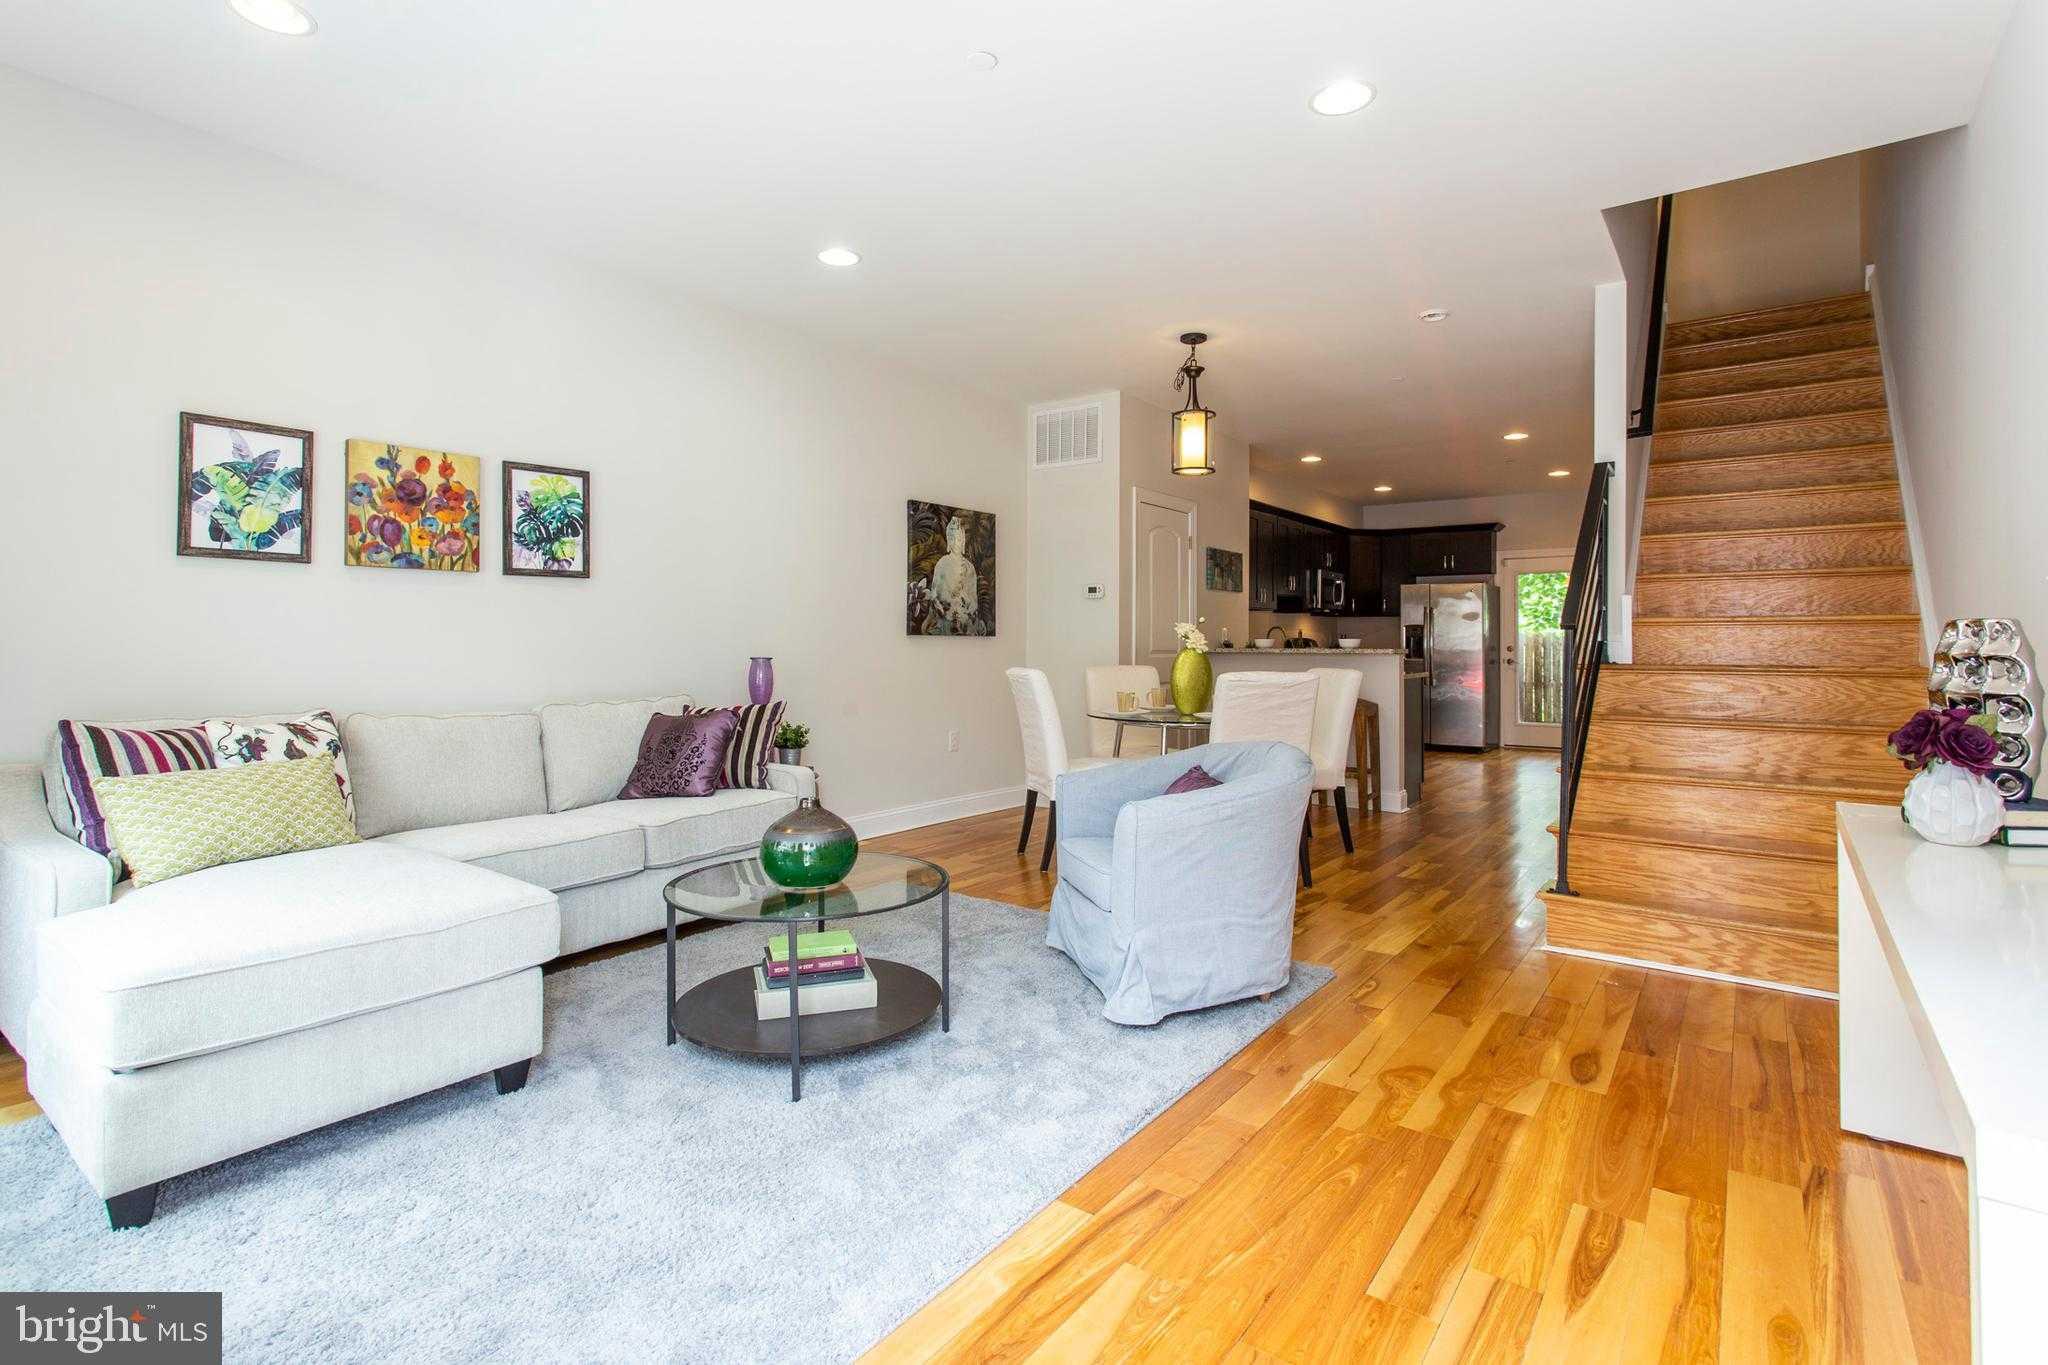 $465,000 - 3Br/3Ba -  for Sale in Newbold, Philadelphia